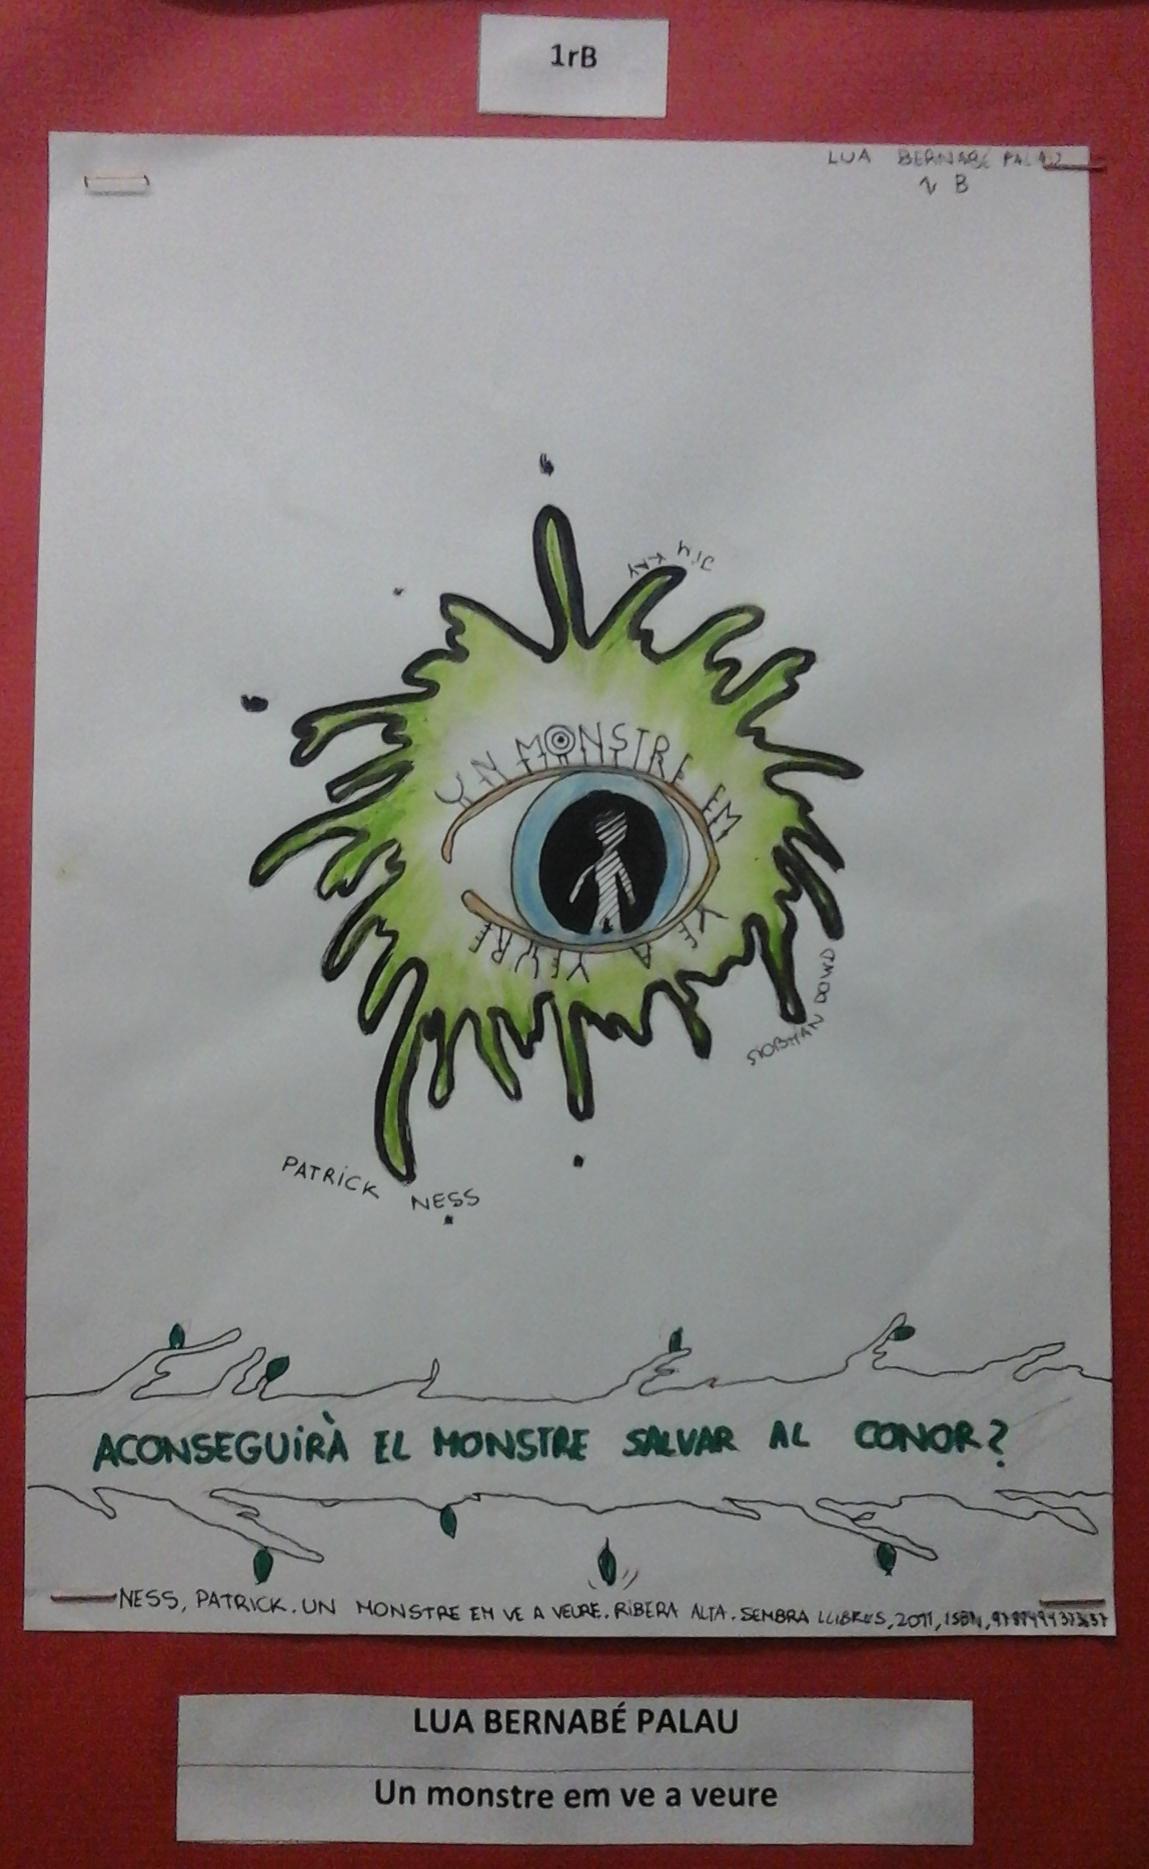 Lua Bernabé1rB